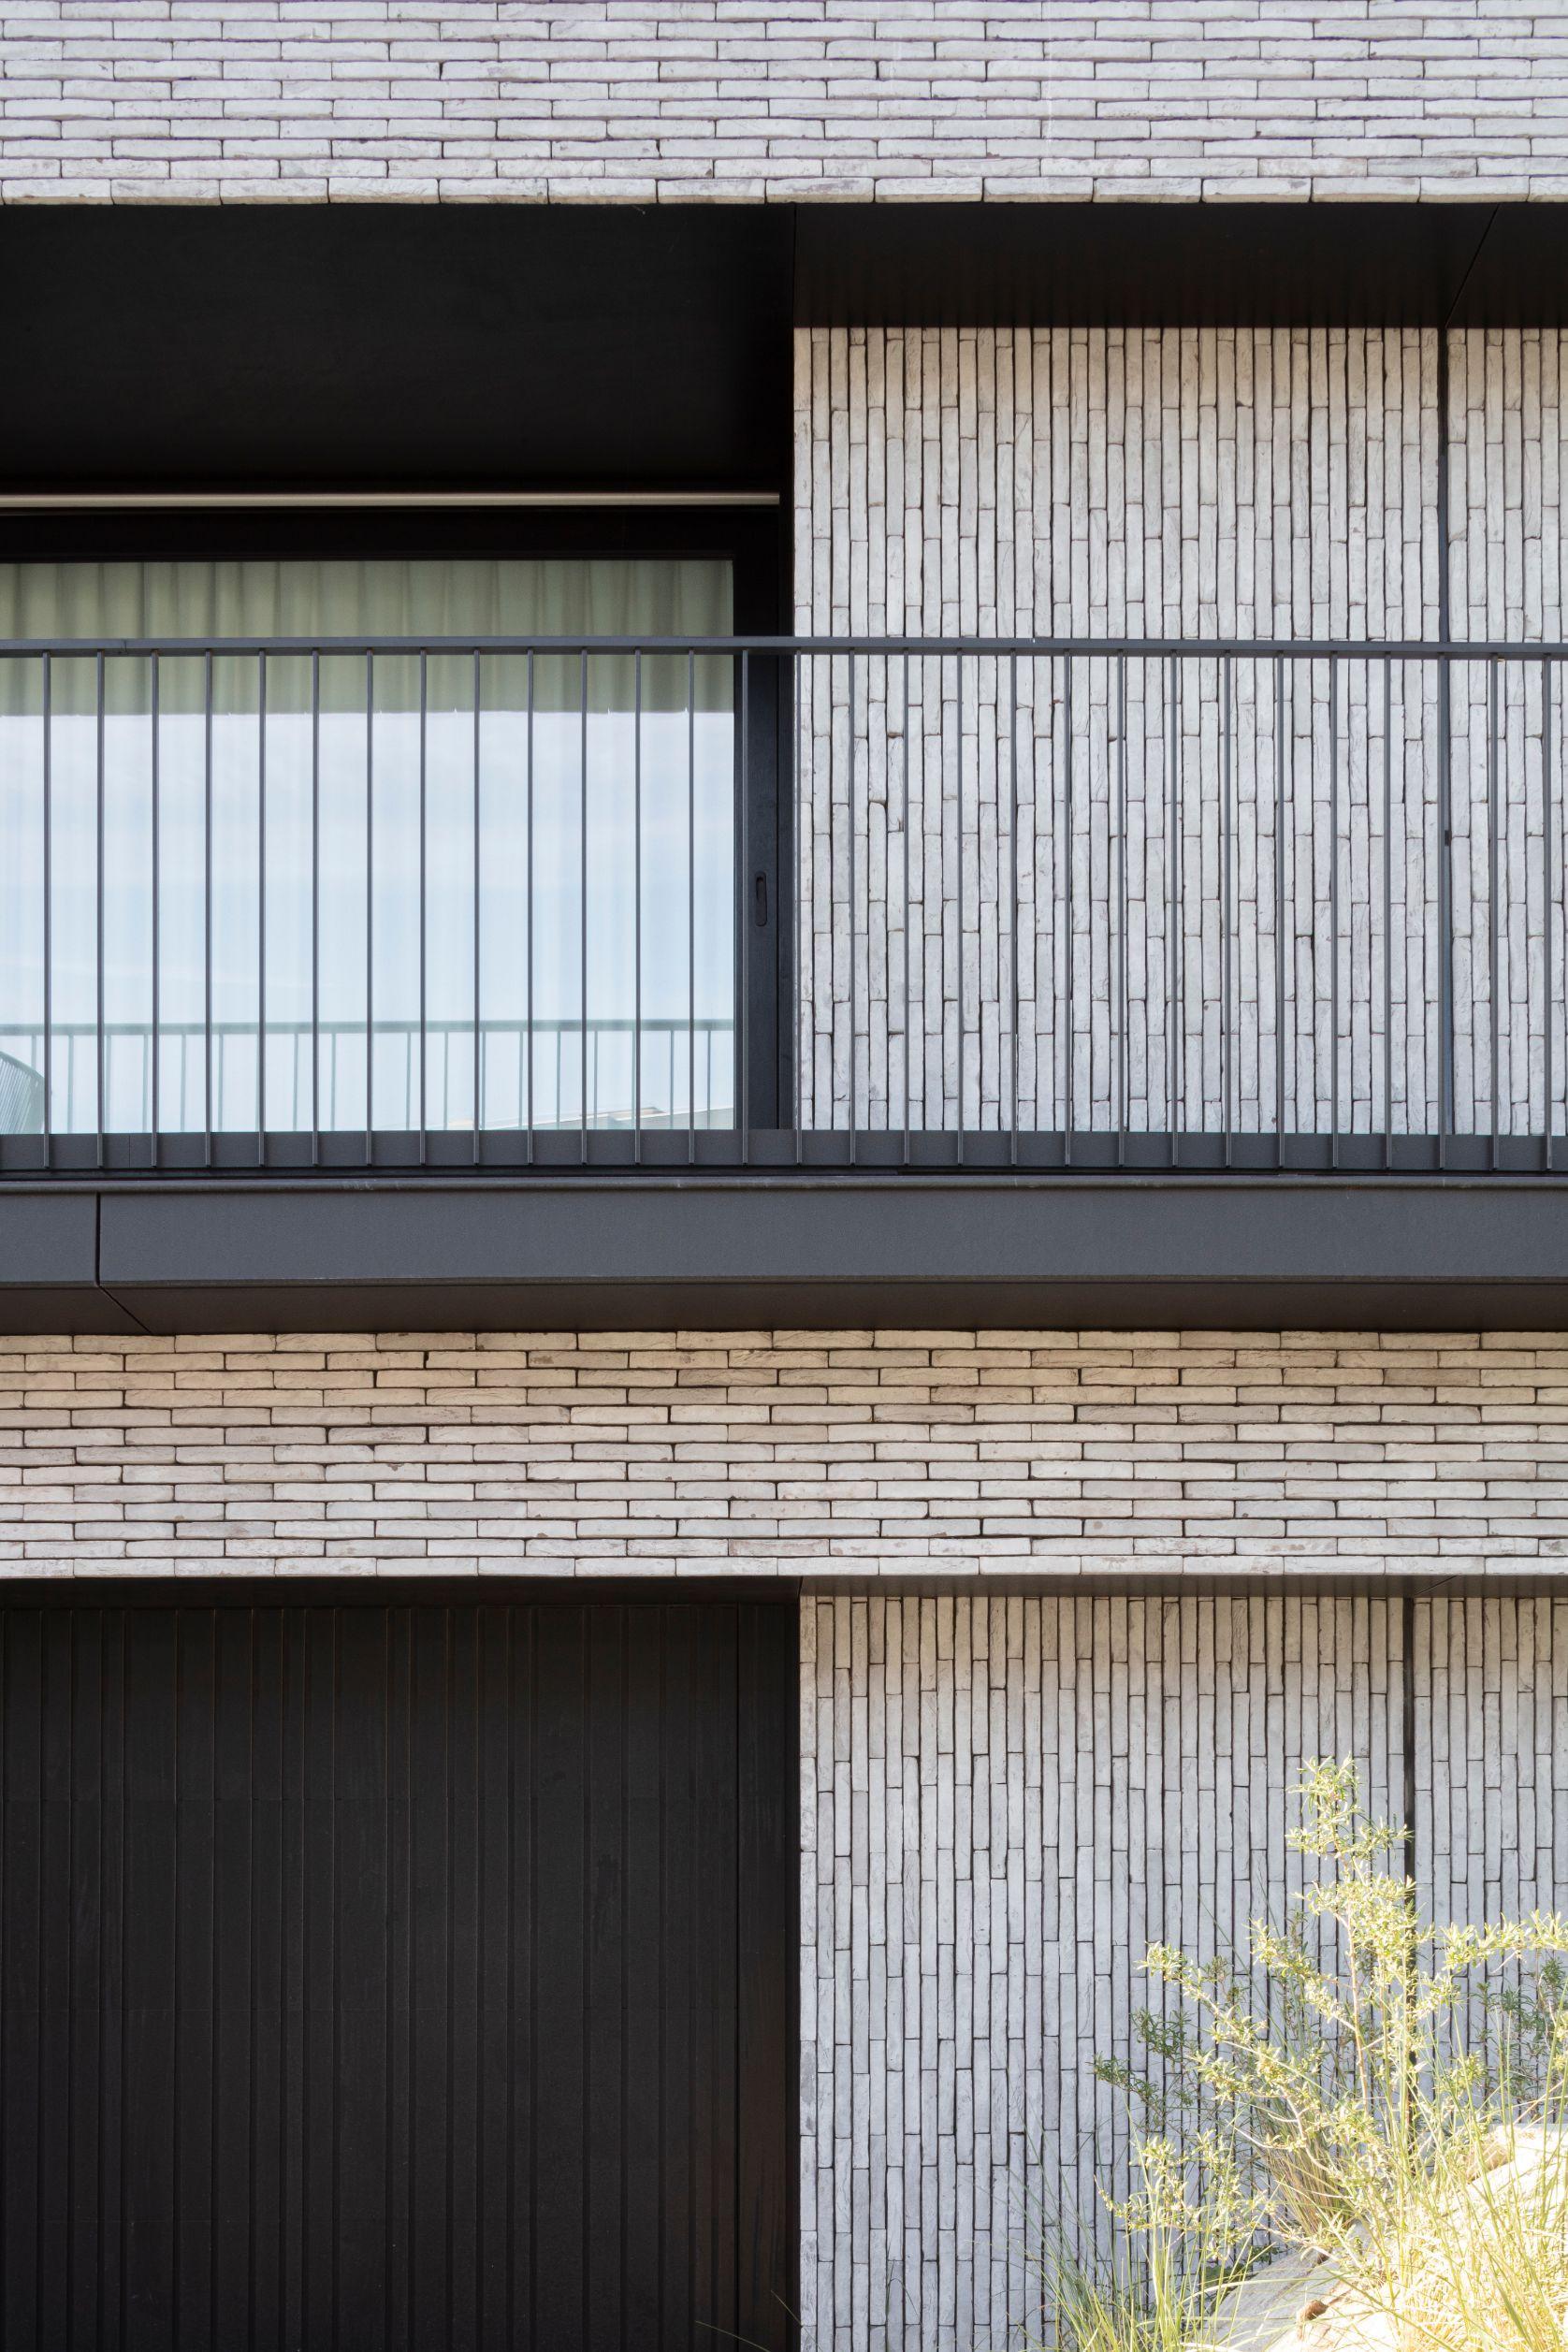 Pierre Paulin - Rietveldprojects - Sint-Idesbald - Tvdv2.jpg